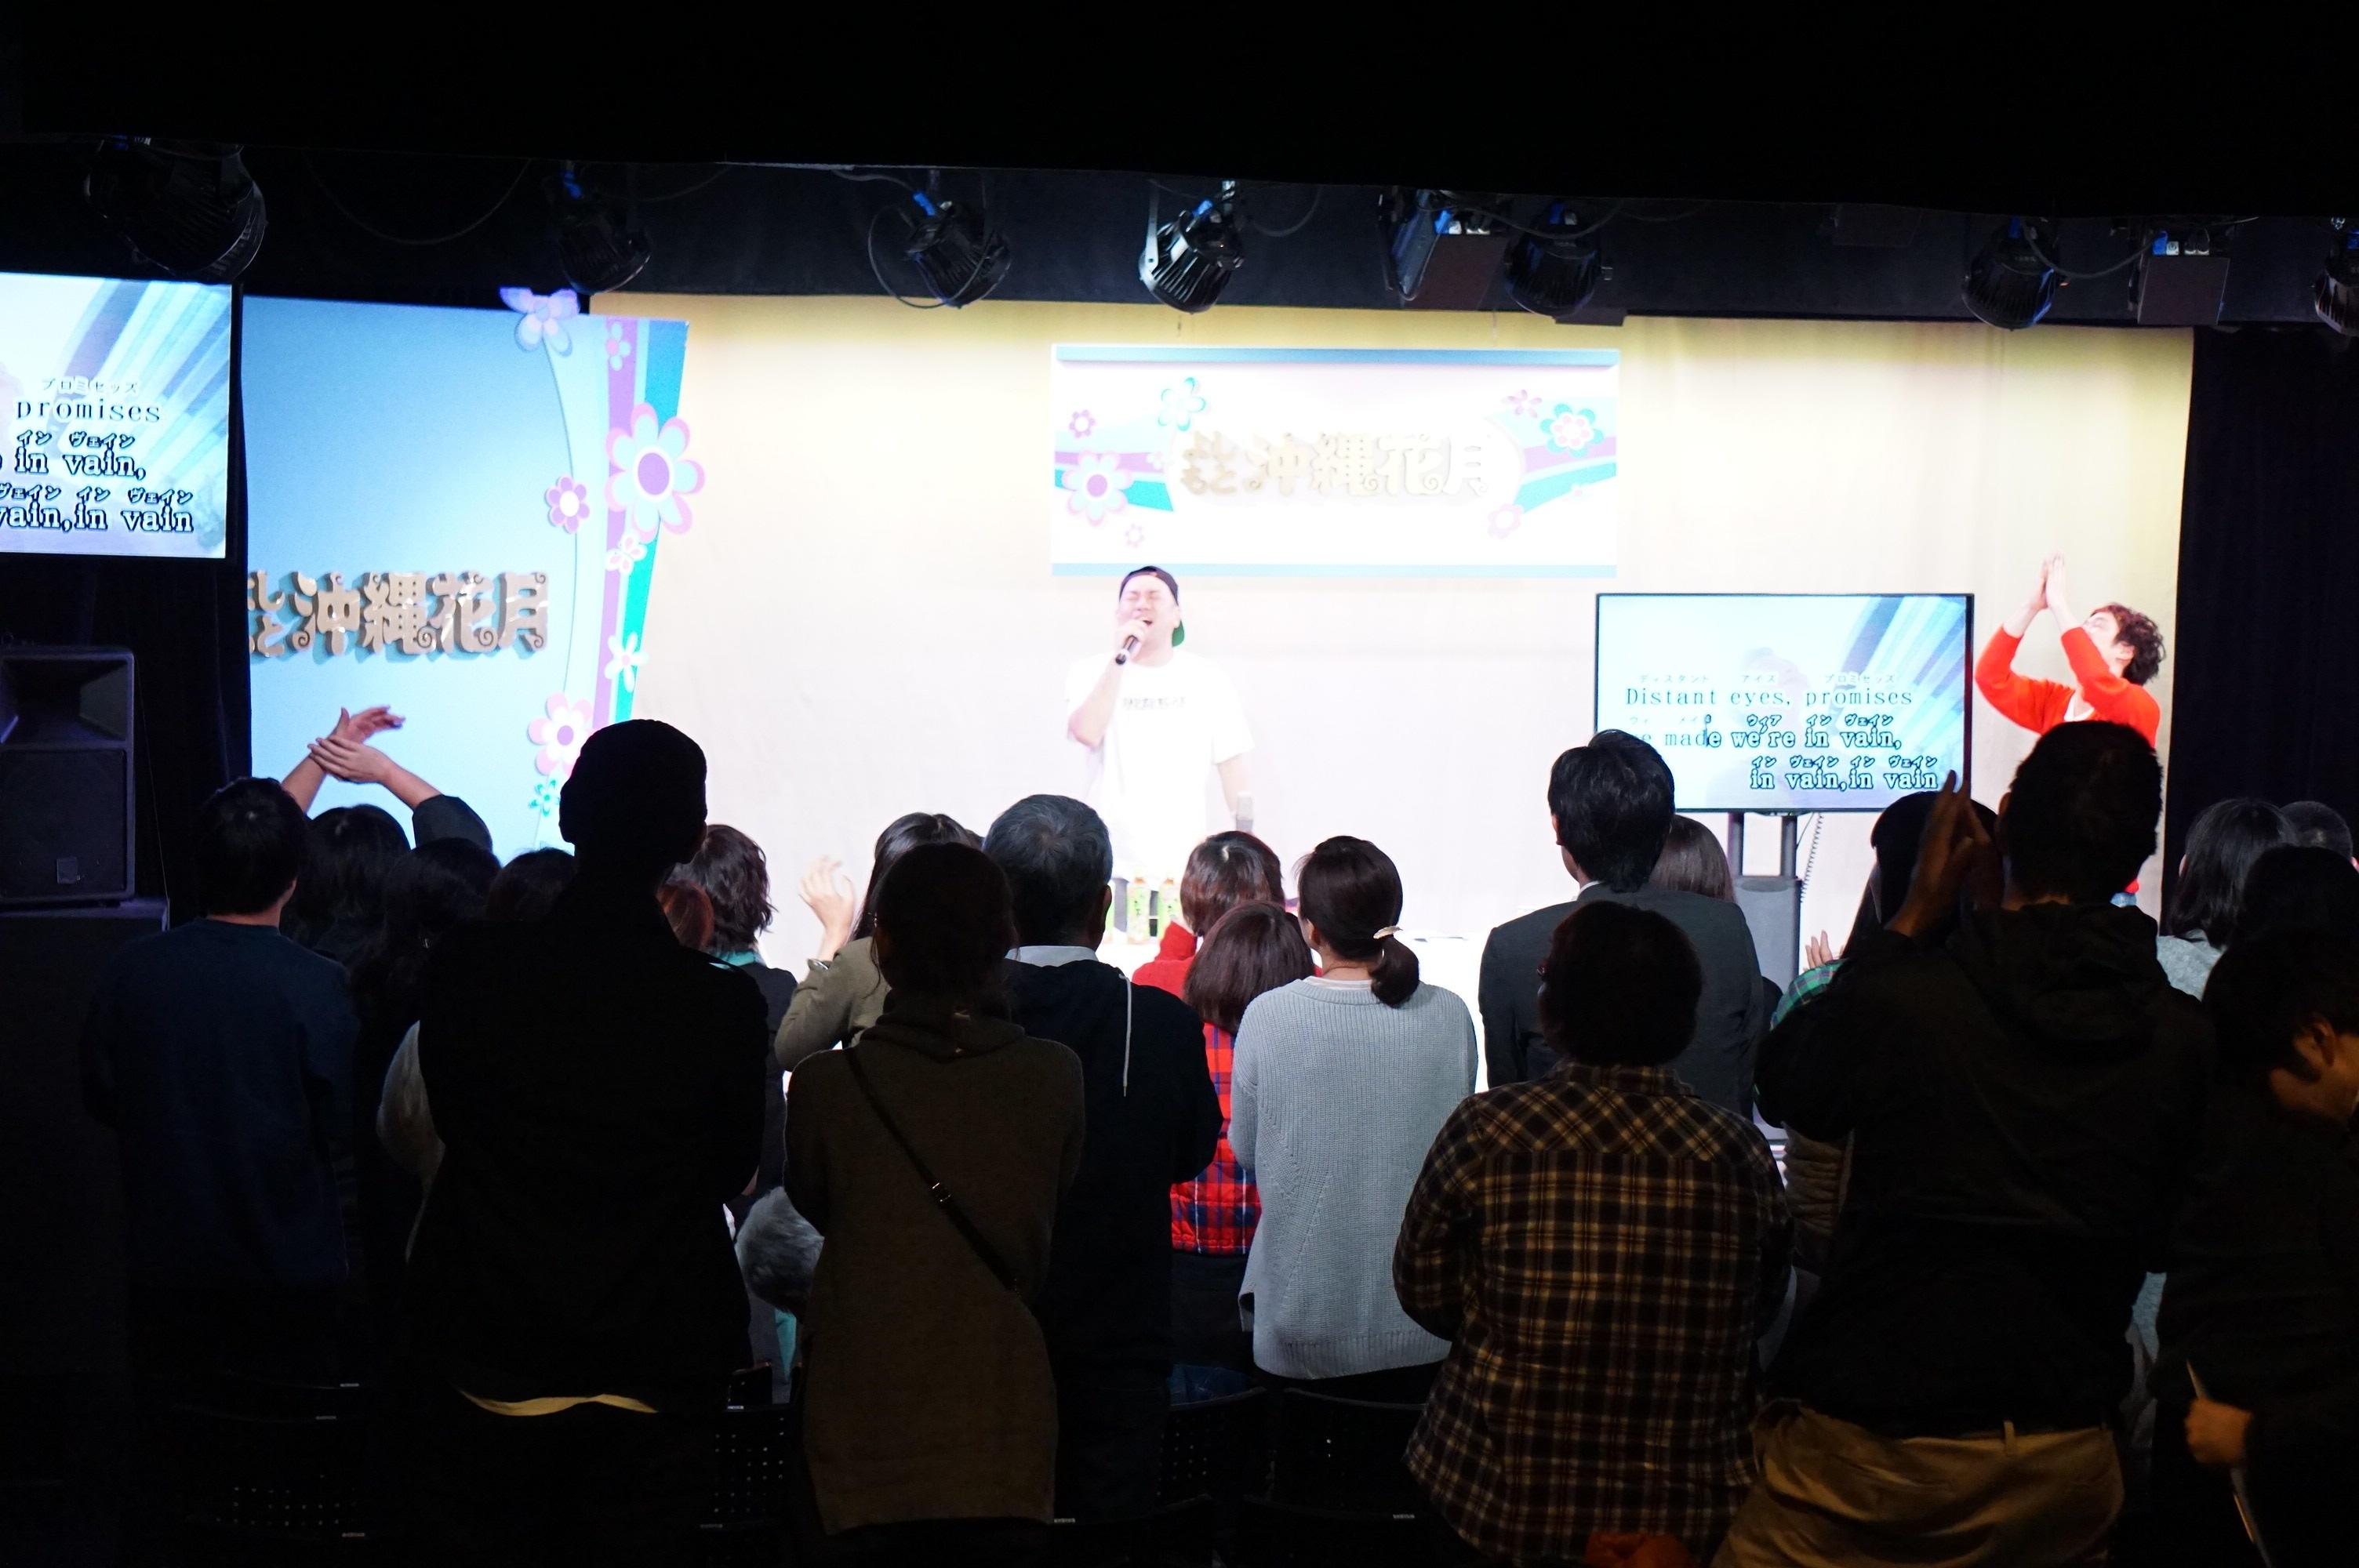 http://news.yoshimoto.co.jp/20160301173427-7778c24e56699f2f9a47f5eeede3cf7b81afea98.jpg